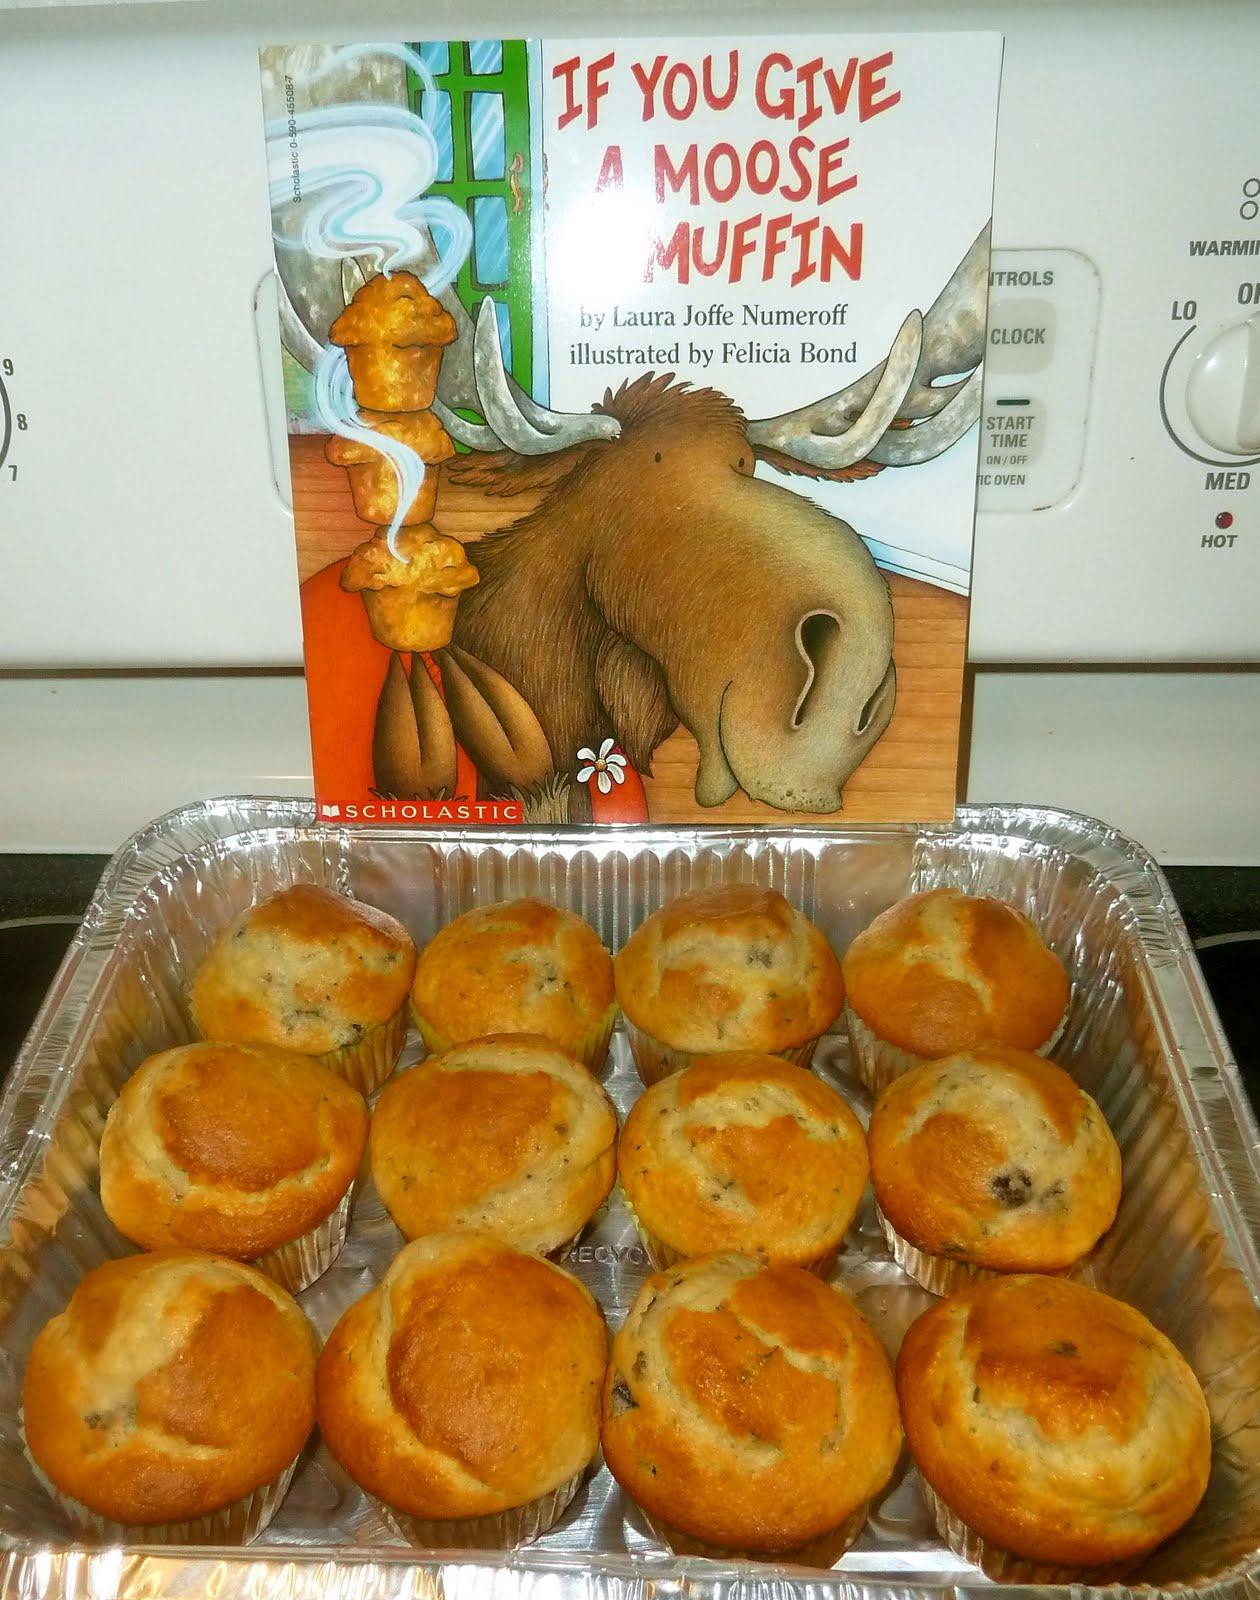 We Had A Lot Of Fun With If You Give A Moose A Muffin